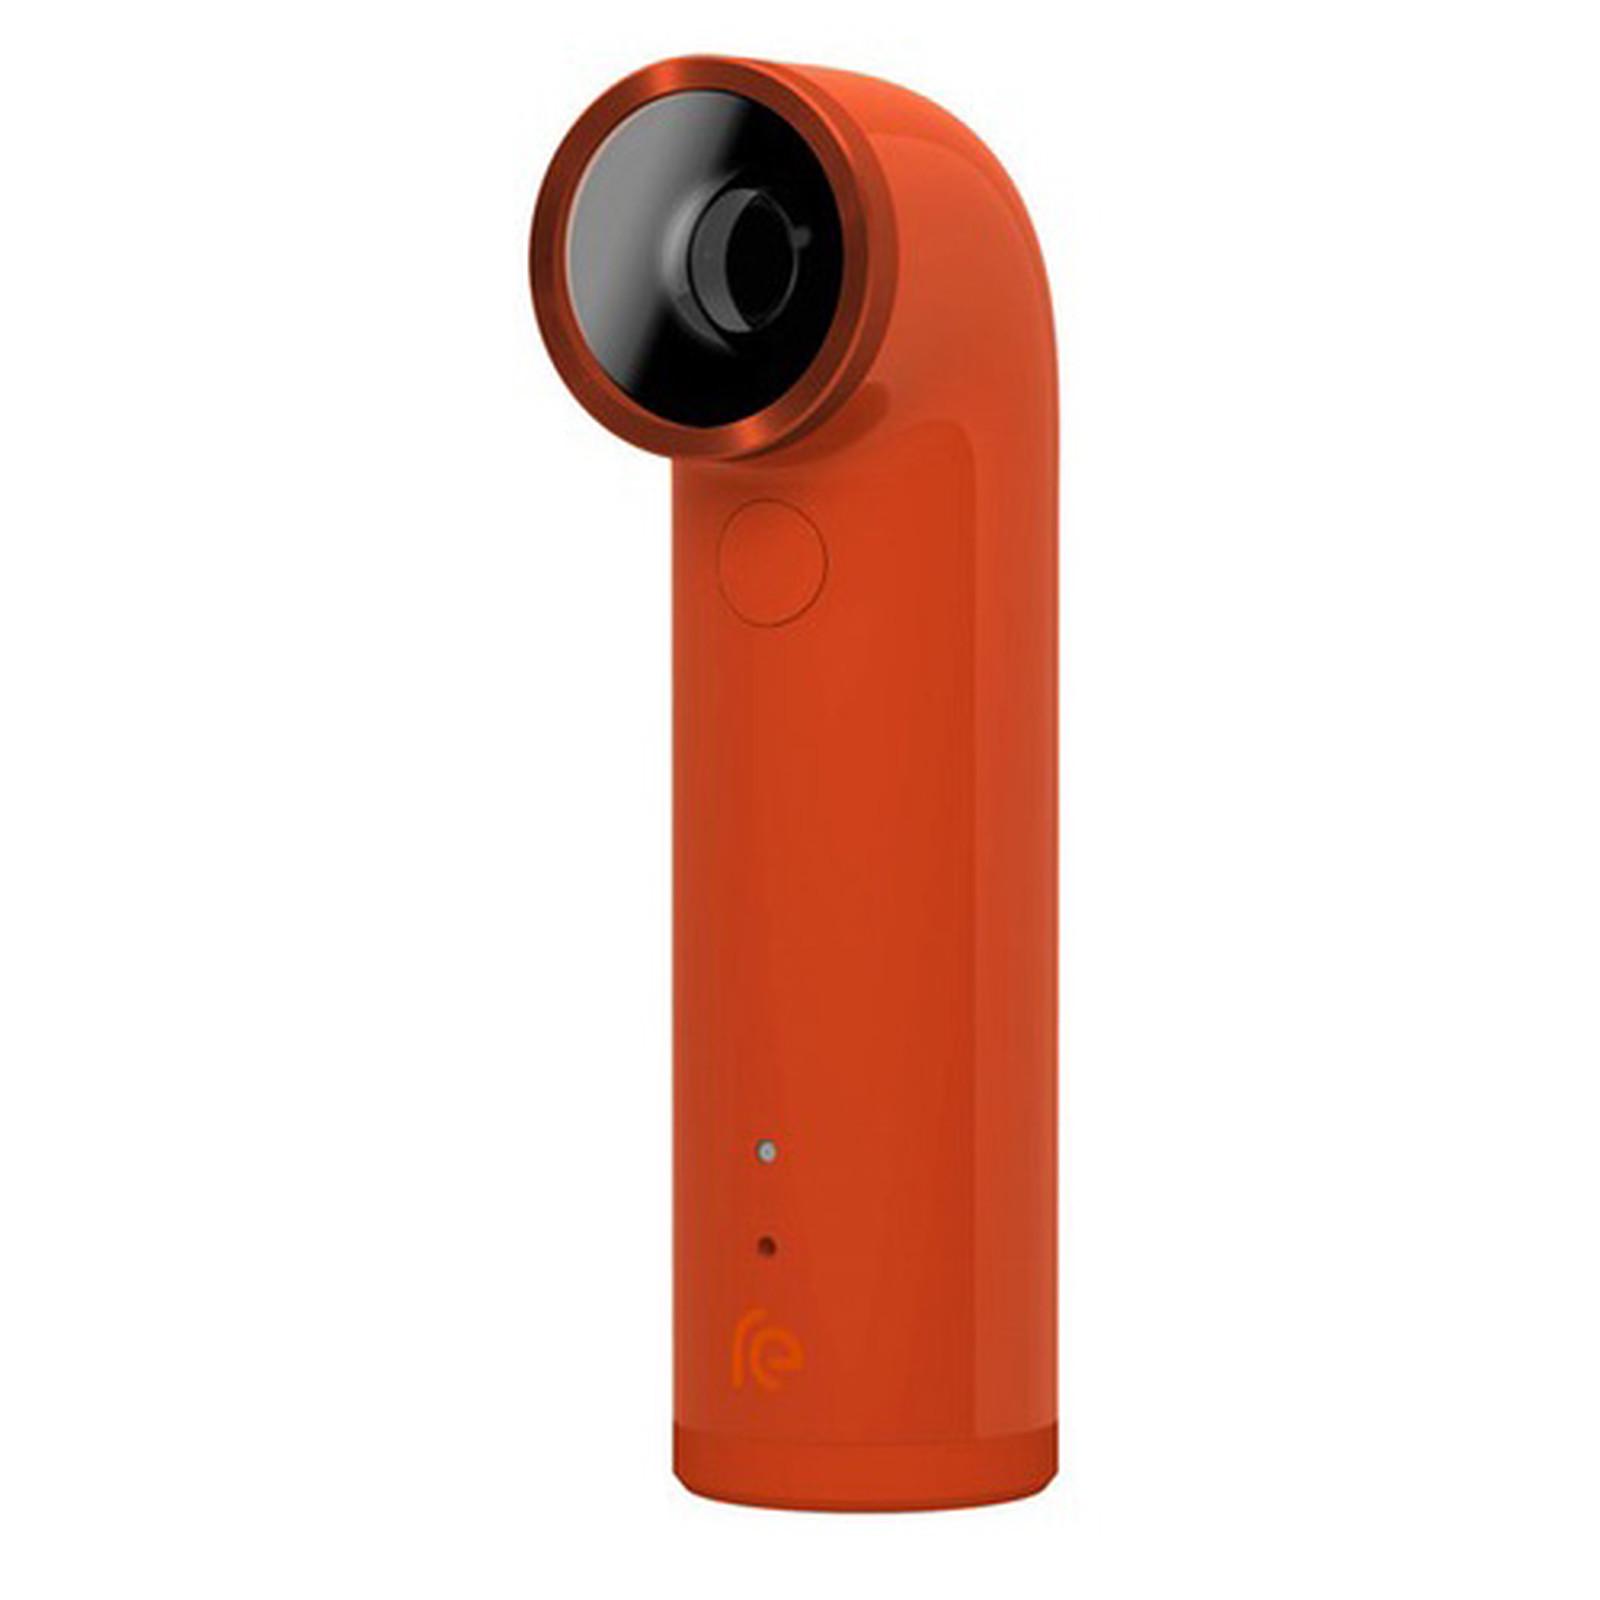 HTC RE Camera Orange